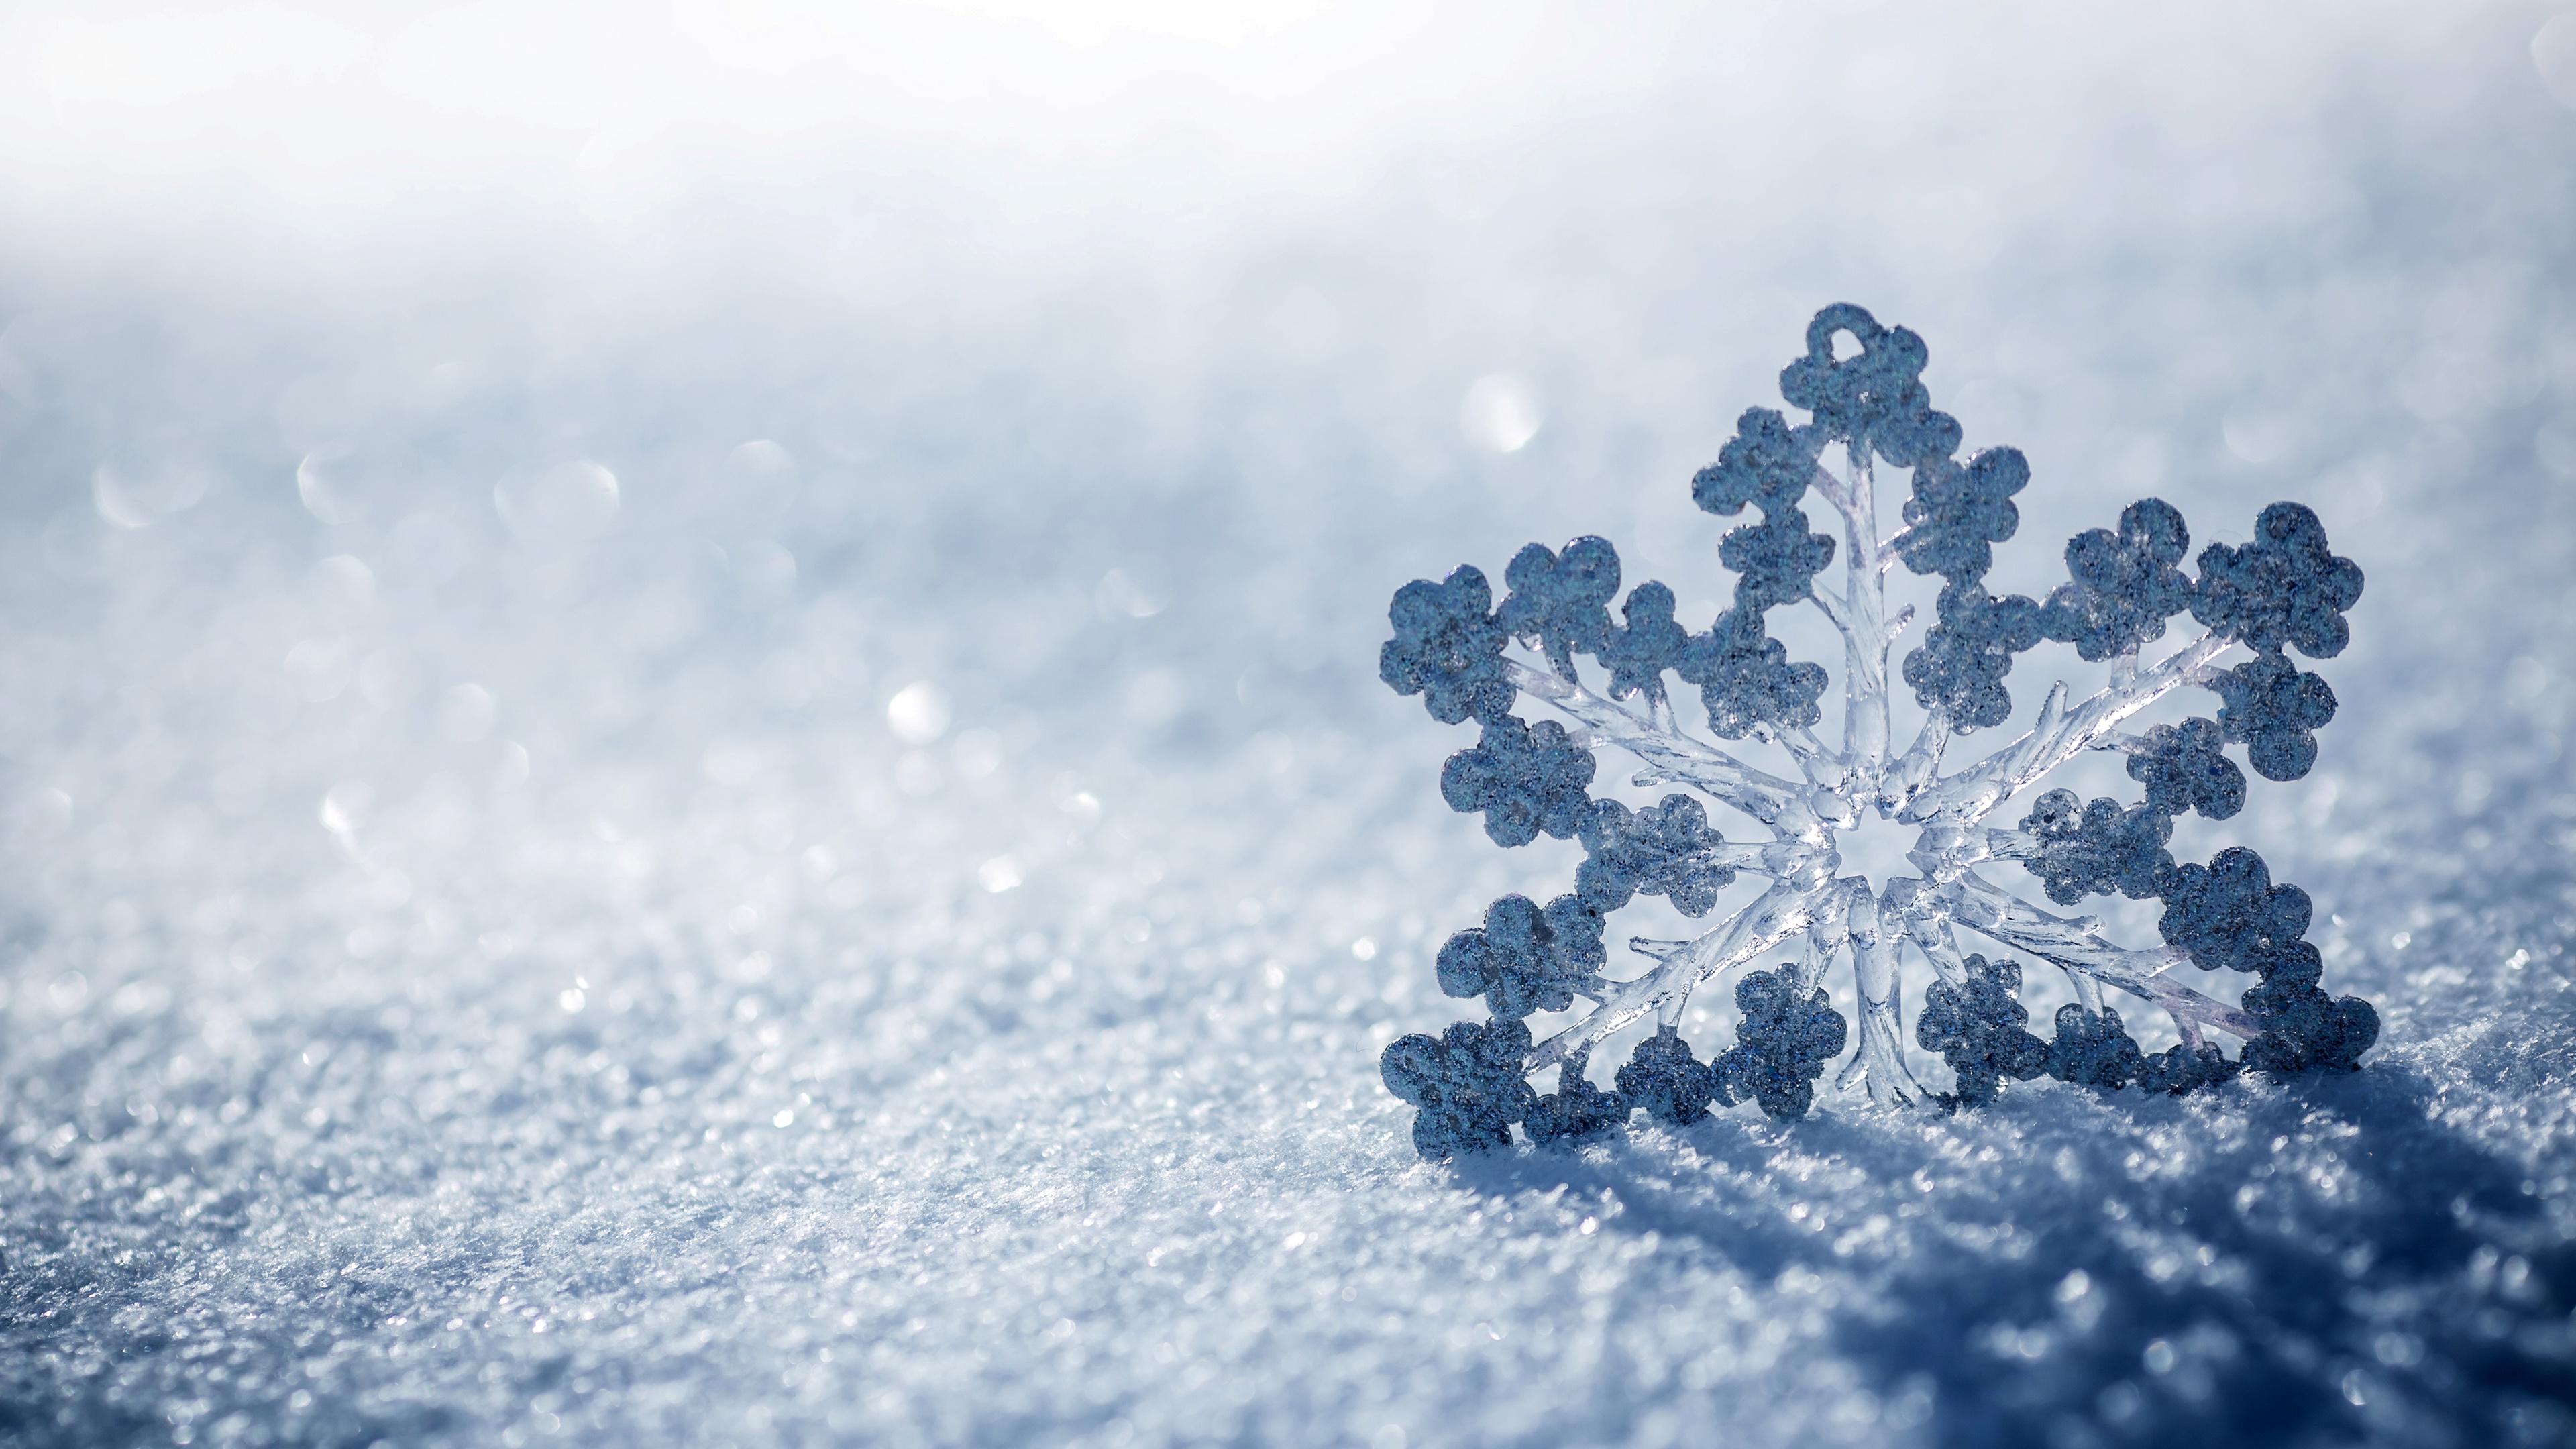 HD Wallpaper | Background Image ID:595450. 3840x2160 Earth Snowflake